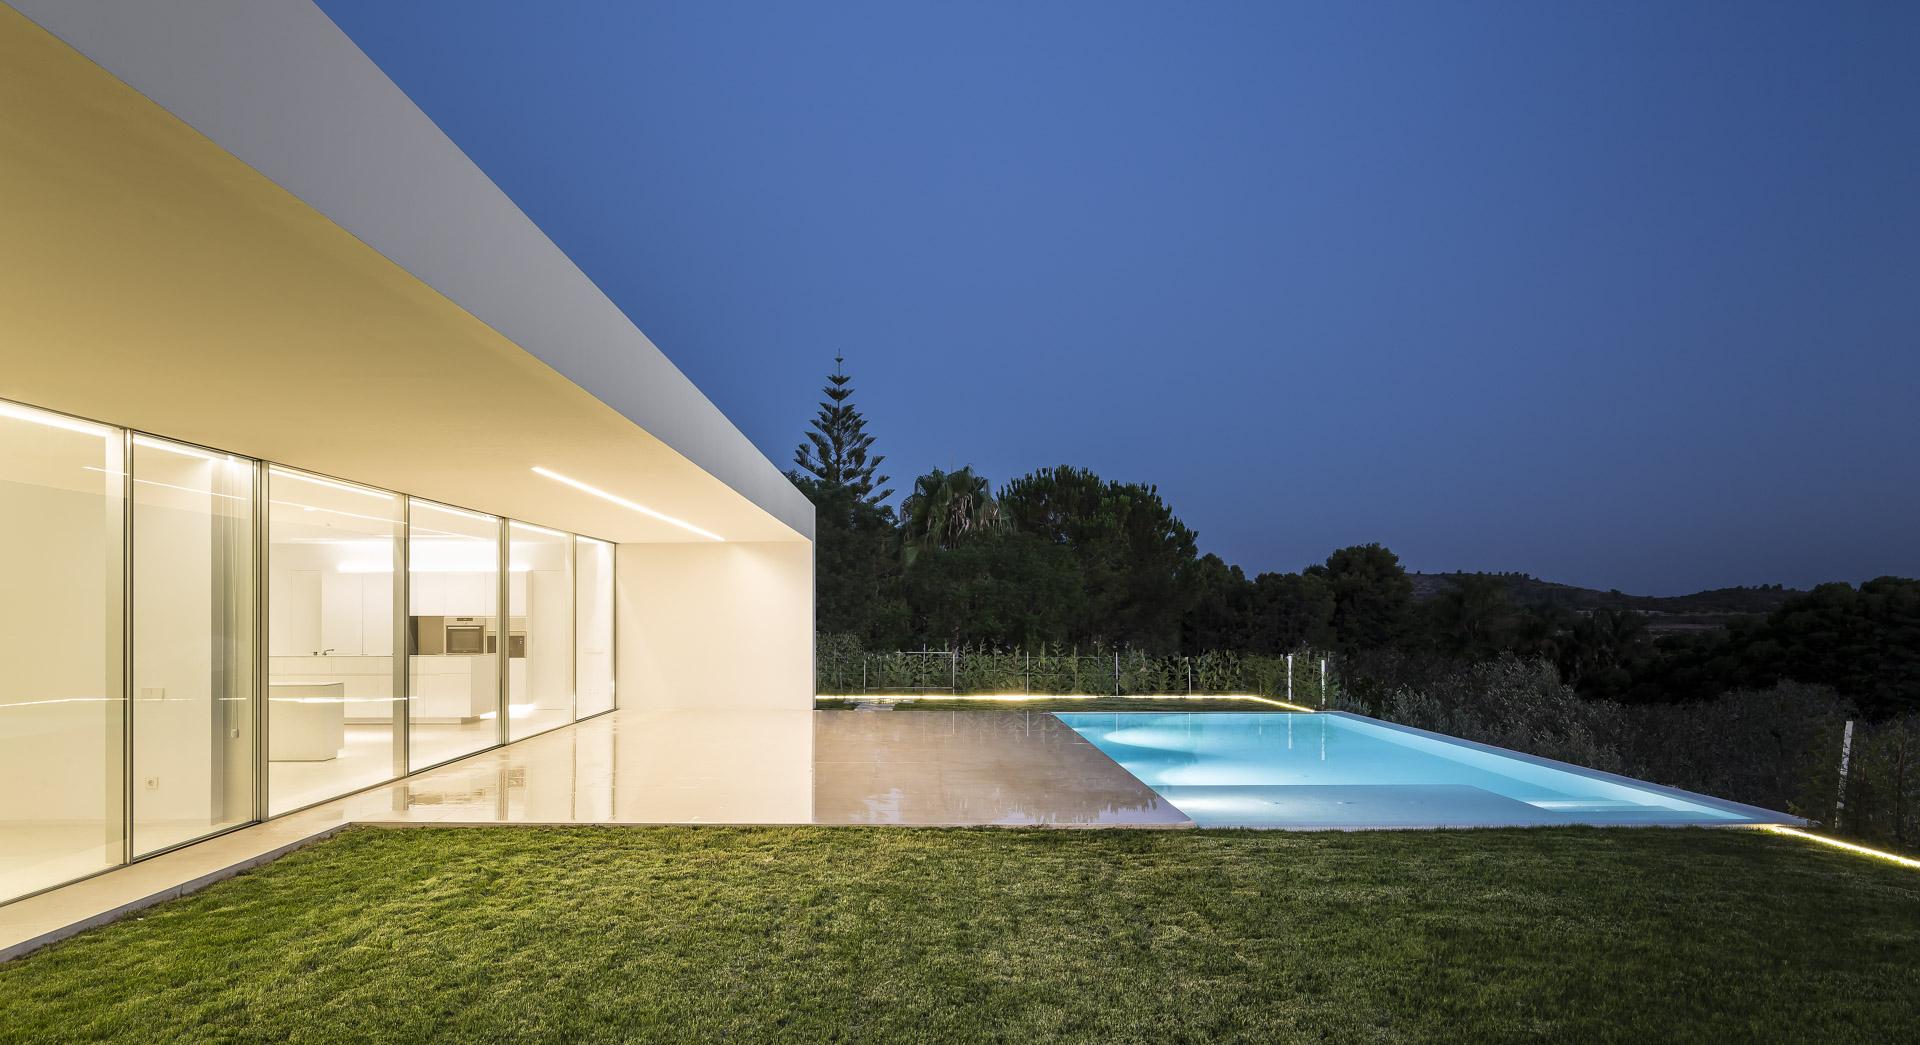 fotografia-arquitectura-valencia-german-cabo-gallardo-llopis-villamarchante-vivienda-60